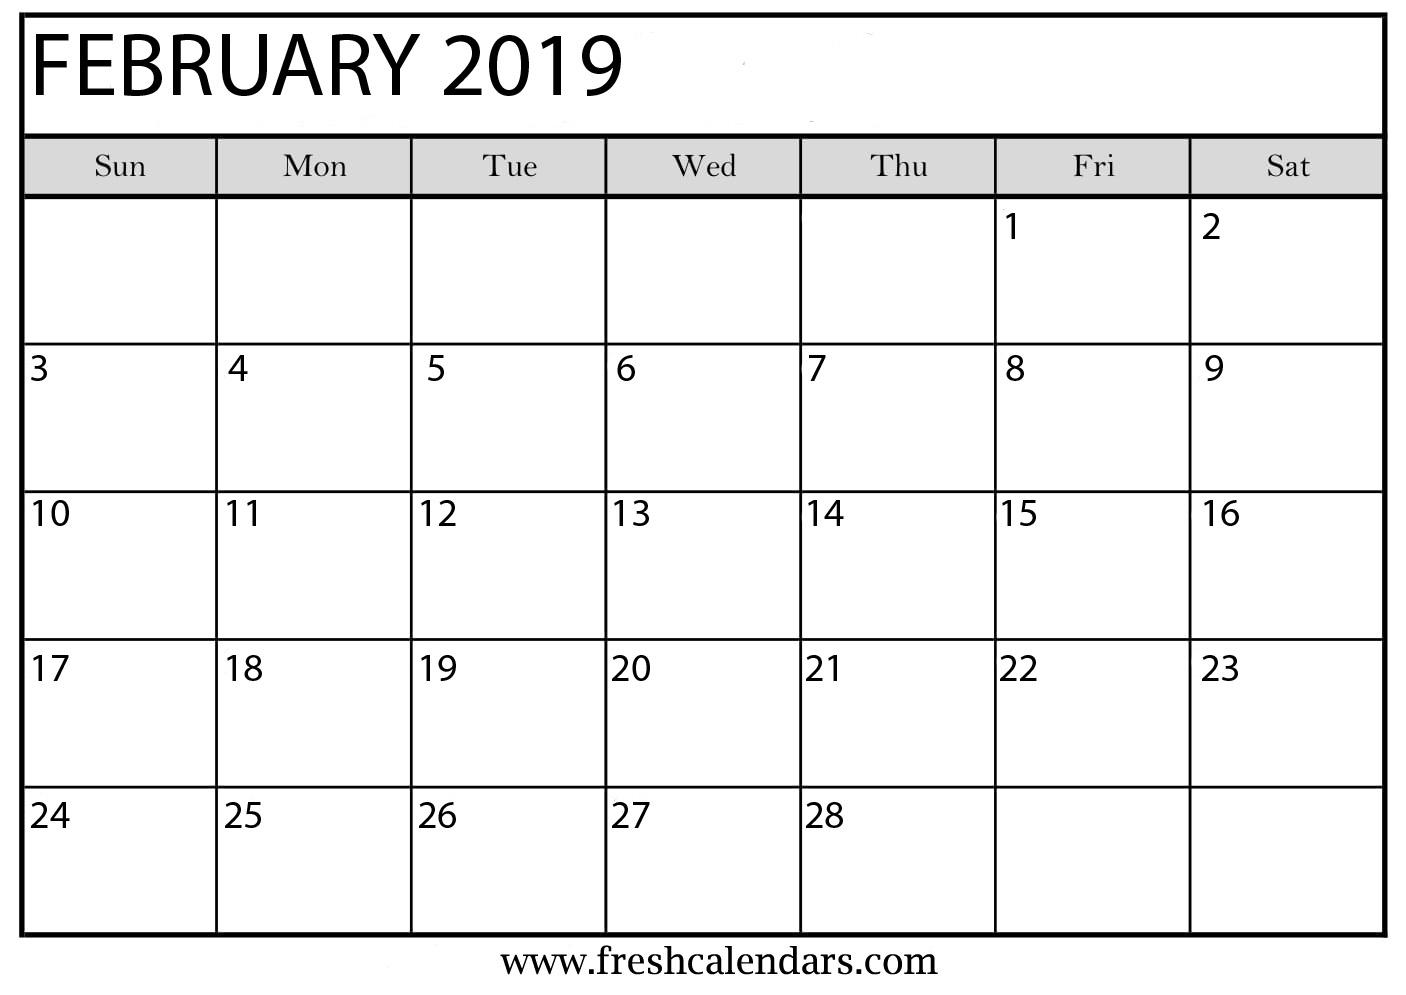 February 2019 India Calendar